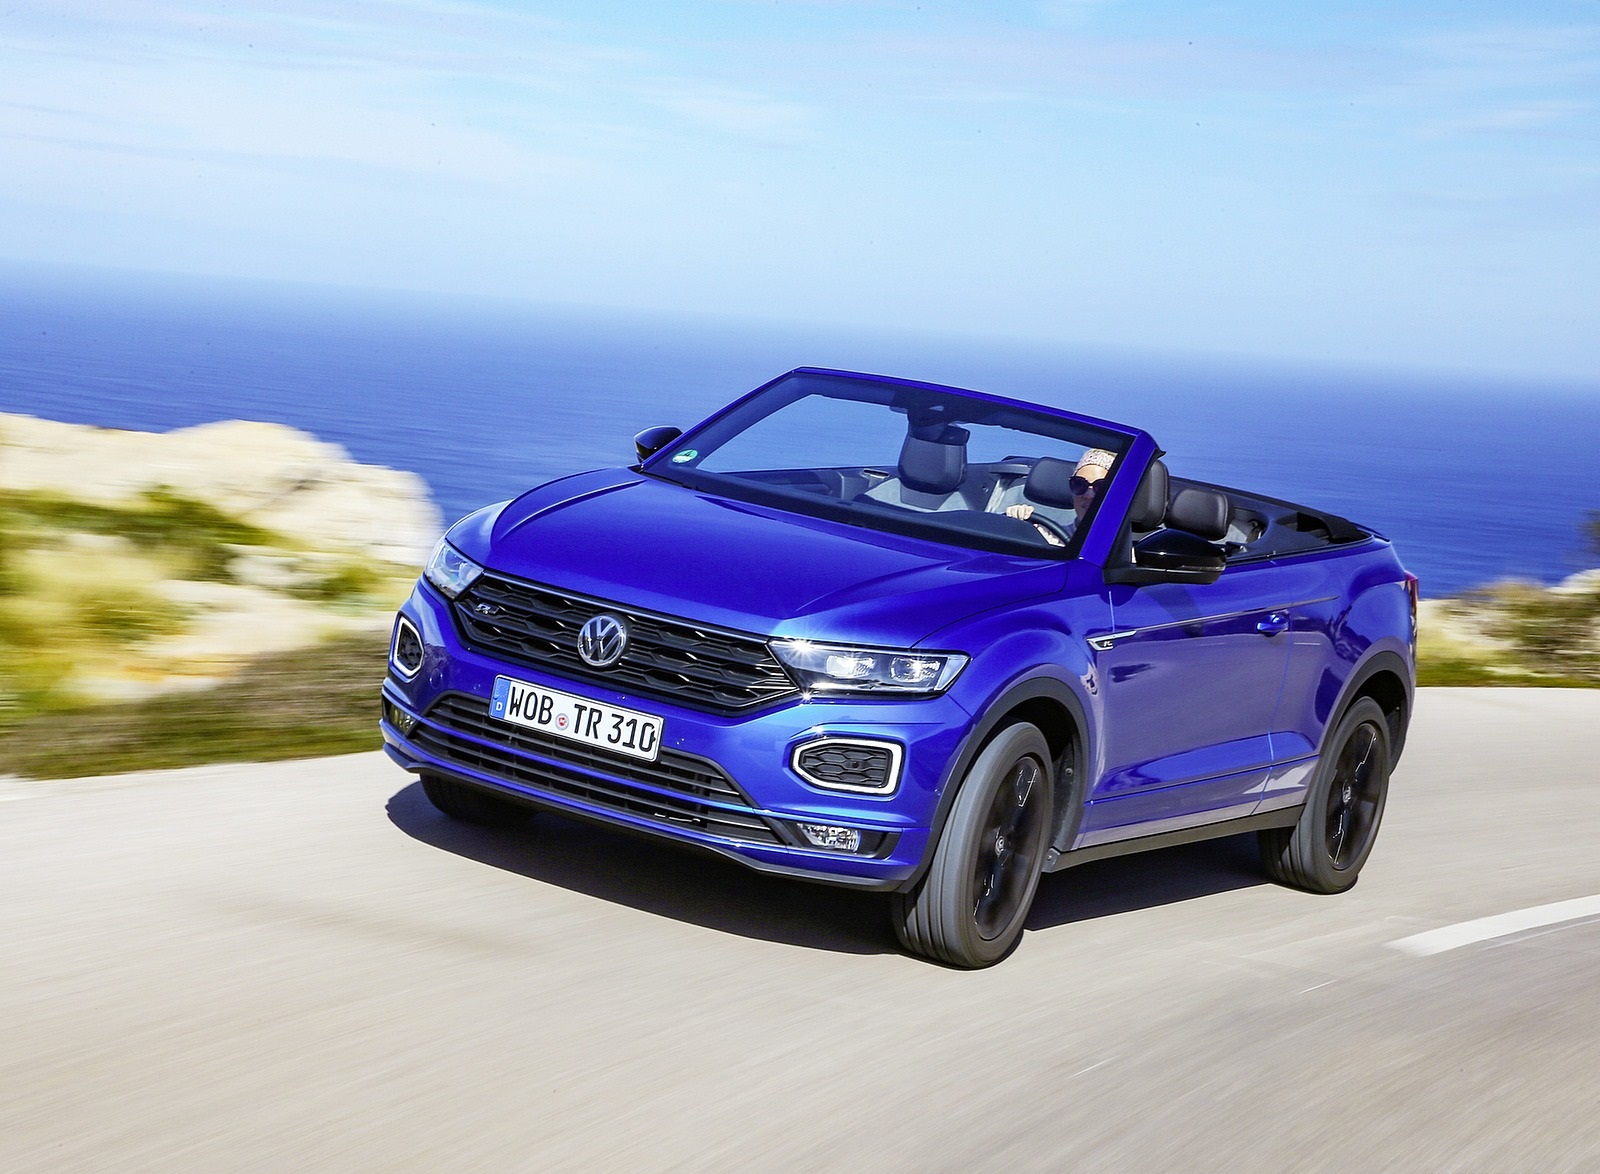 2020 Volkswagen T-Roc Cabriolet Front Three-Quarter Wallpapers (5)